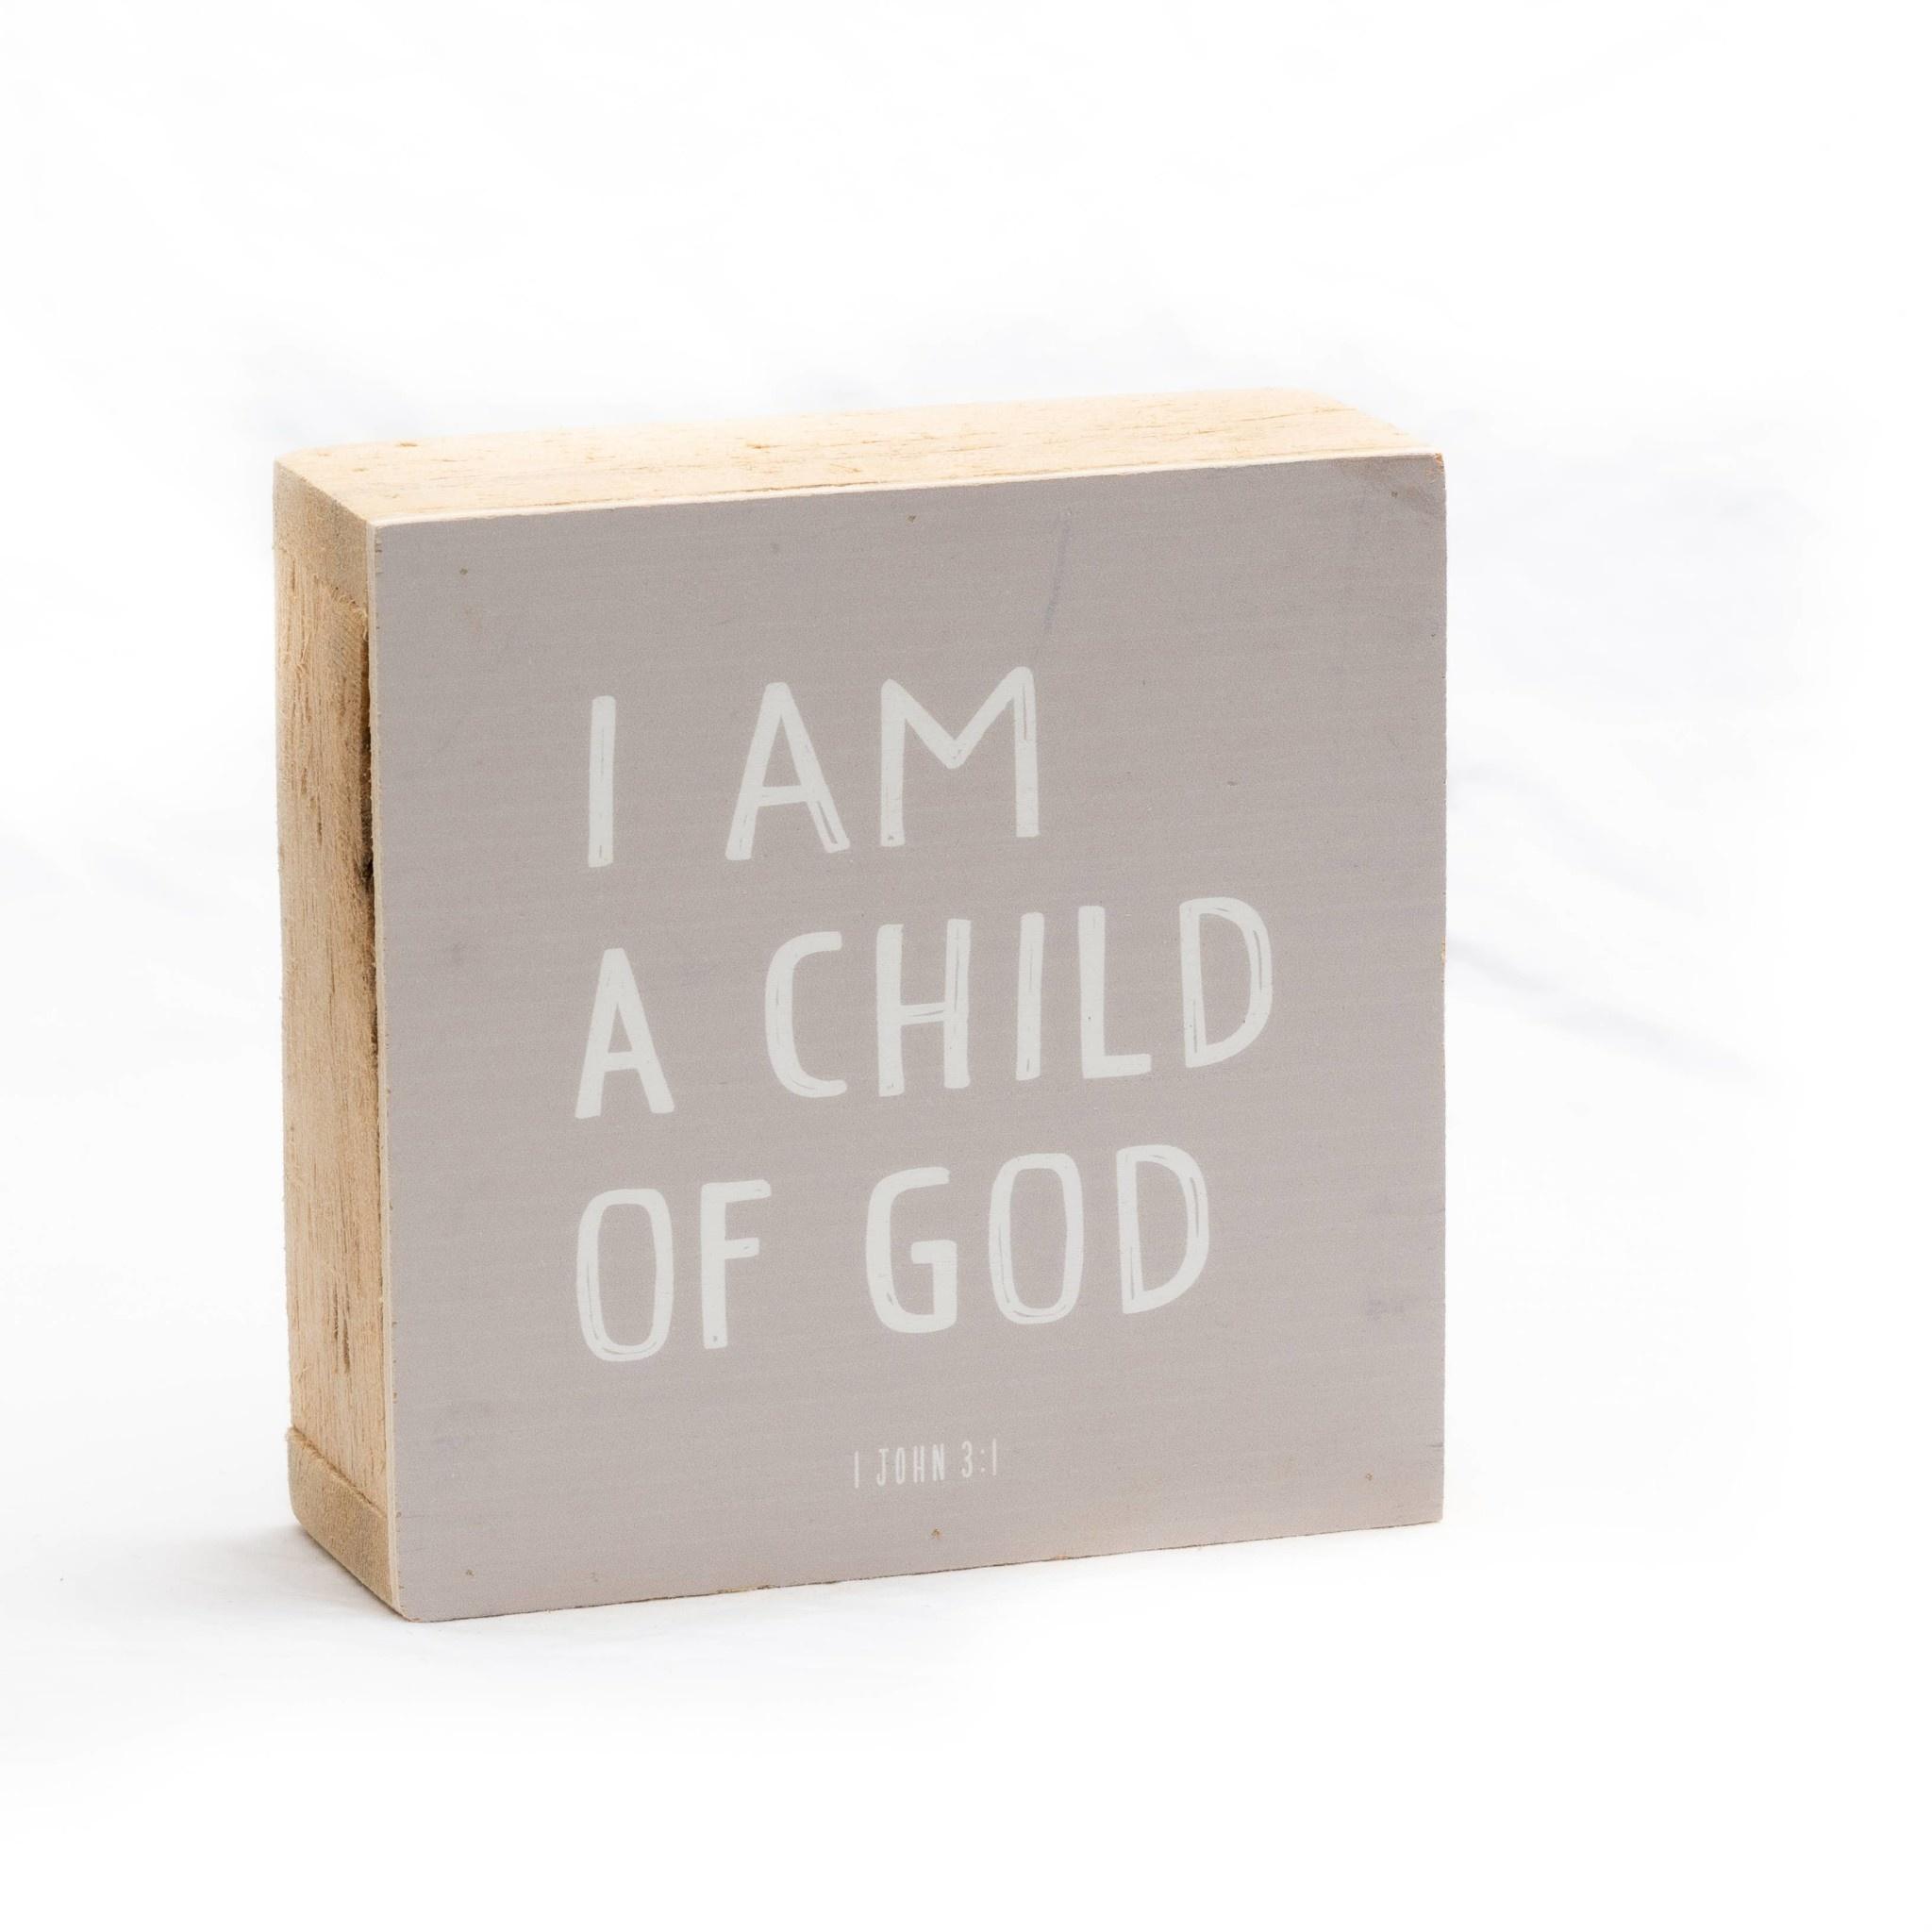 Revelation Culture 6 x 6 Kids Wood Block Sign   I am a child of God  Pink,